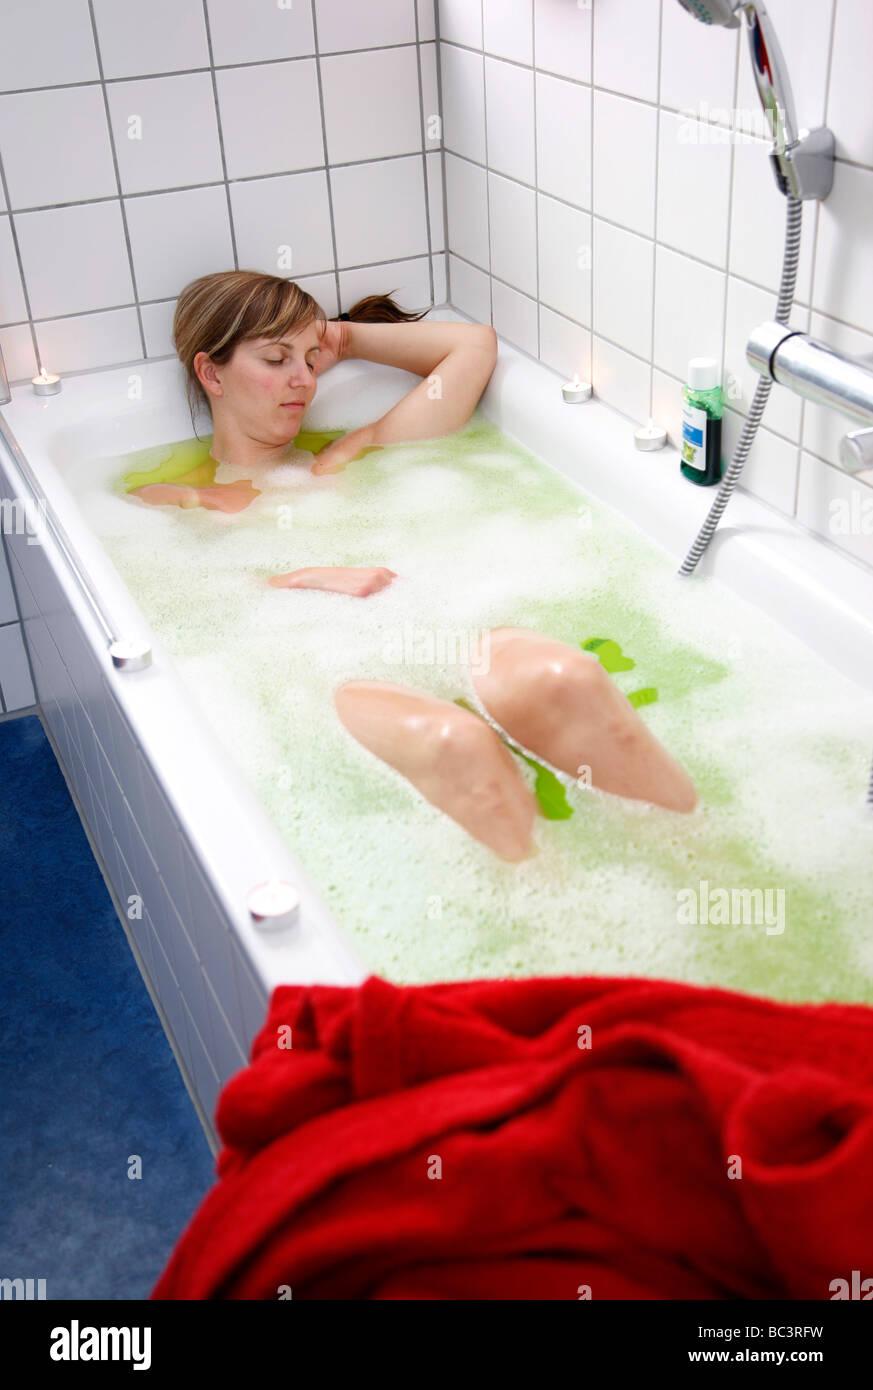 Beautiful Medical Baths Ideas - Luxurious Bathtub Ideas and ...